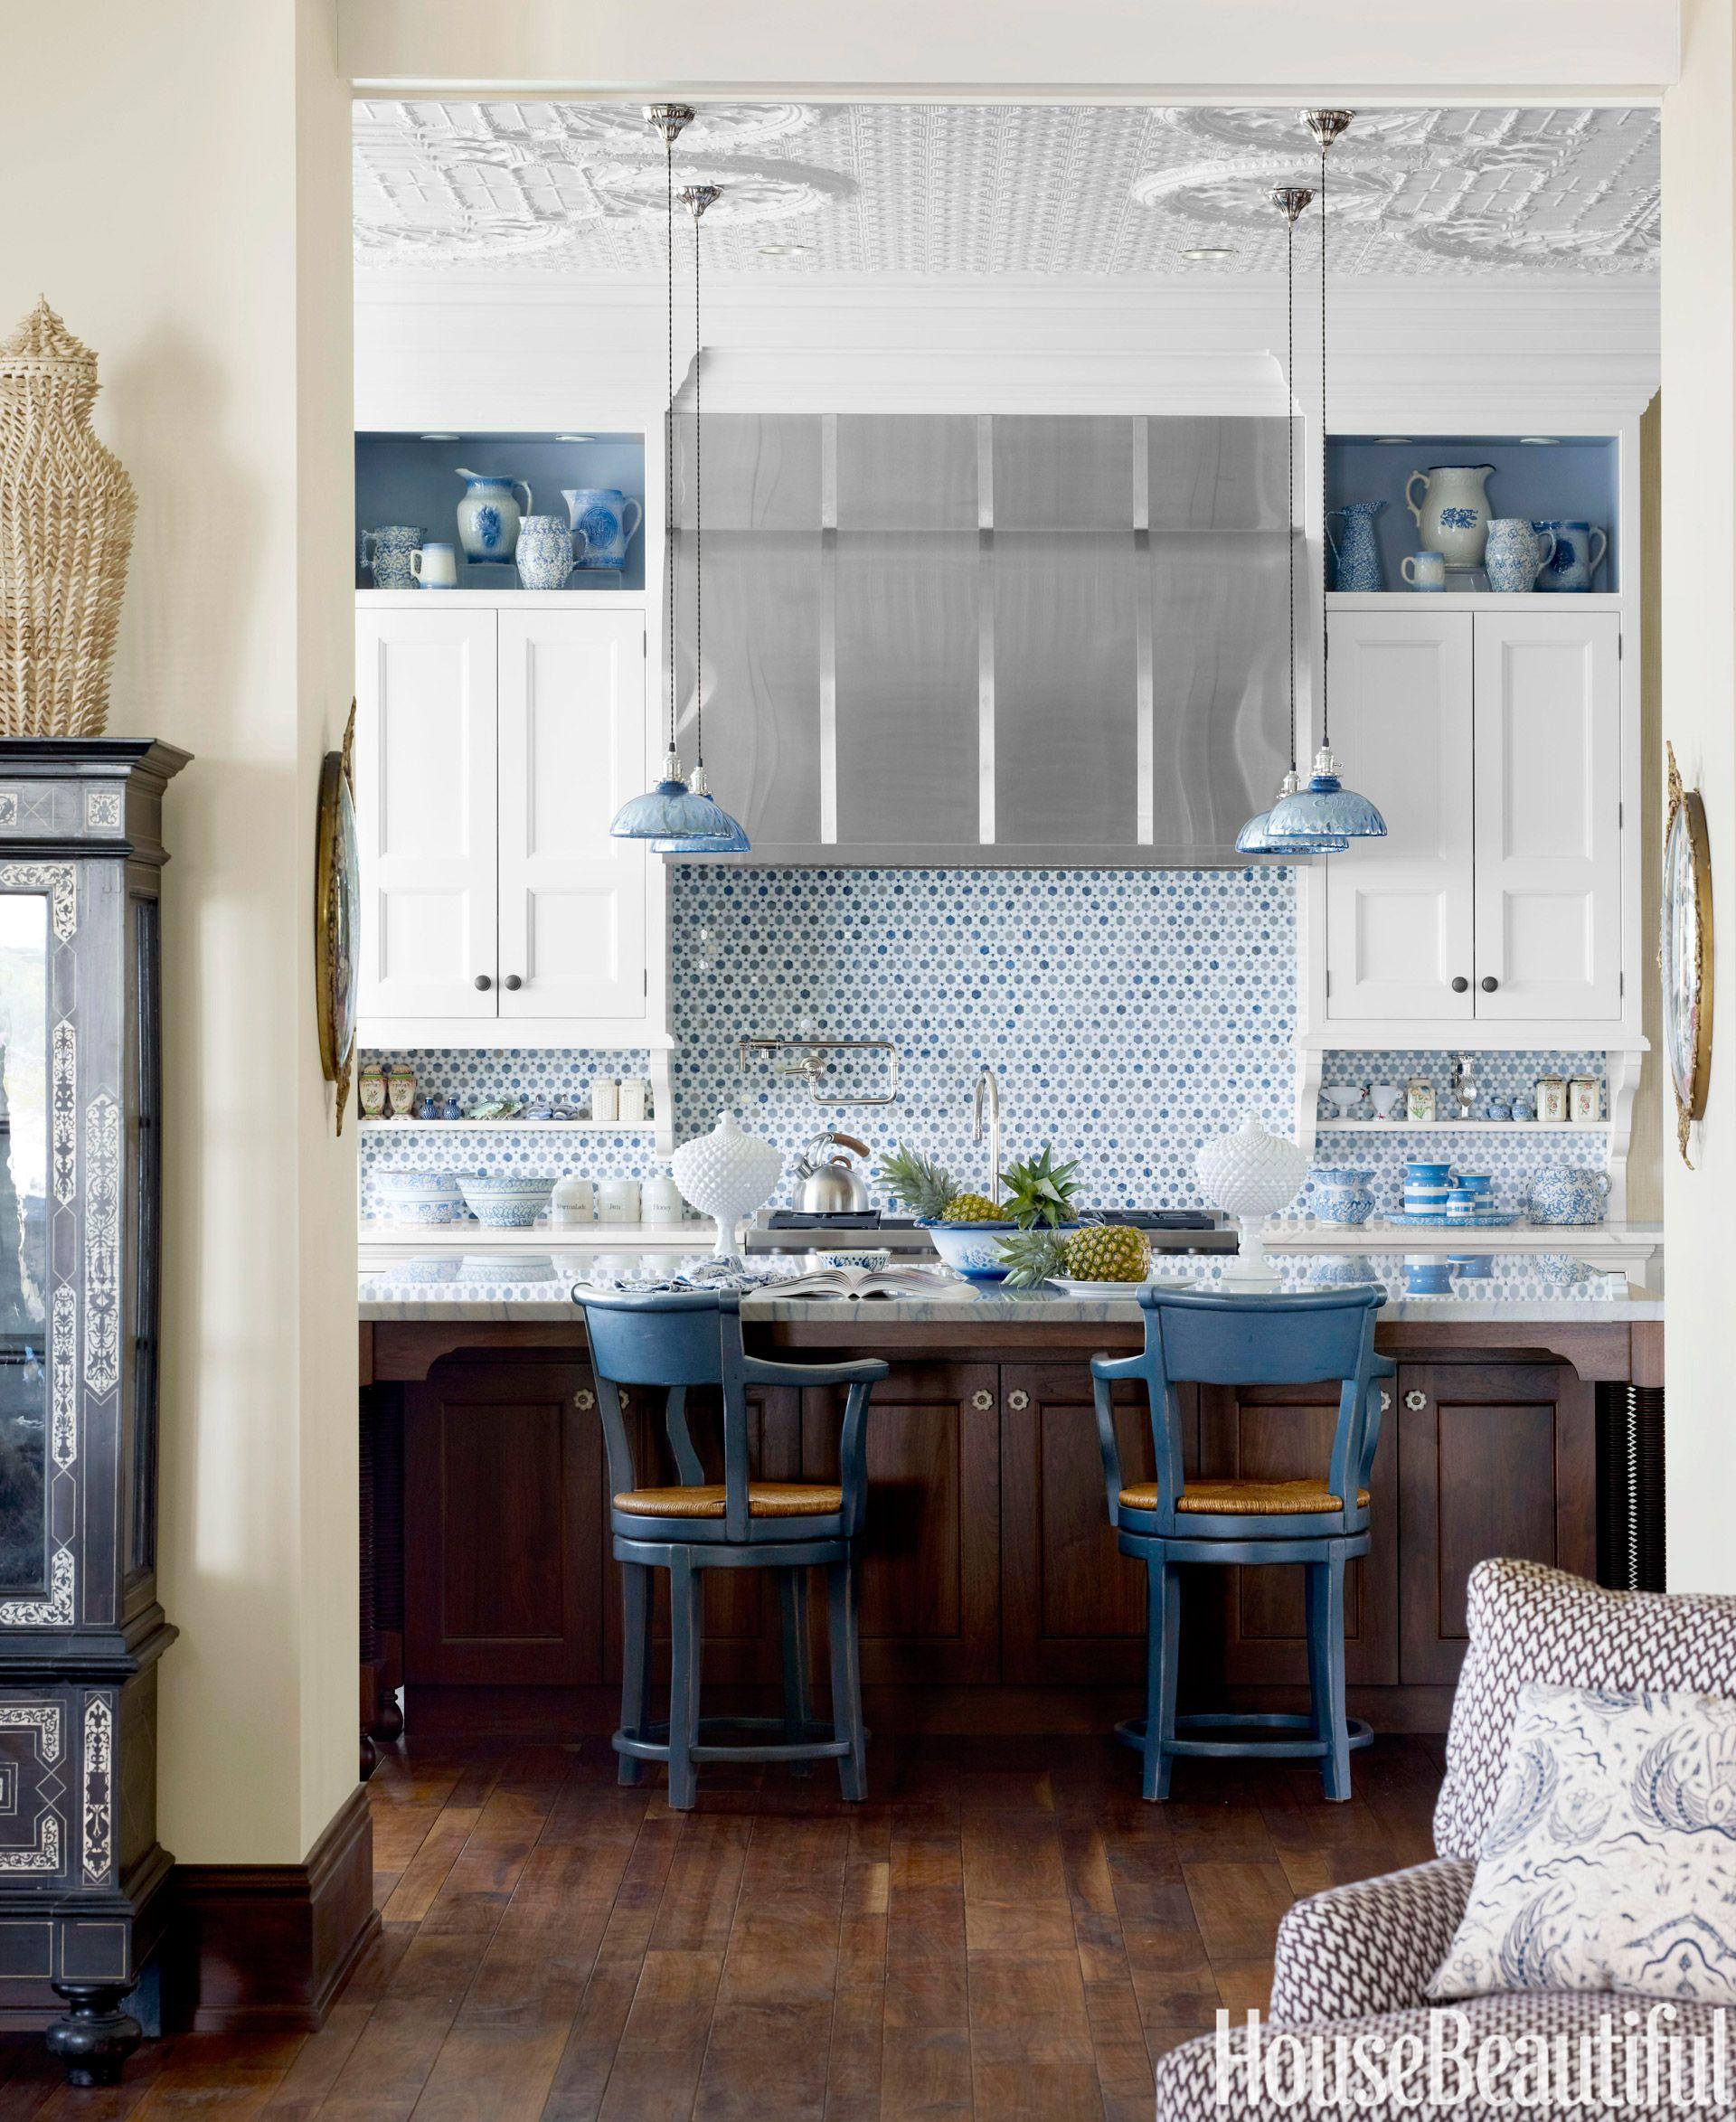 Superbe Interior Home Design Kitchen. Interior Home Design Kitchen S